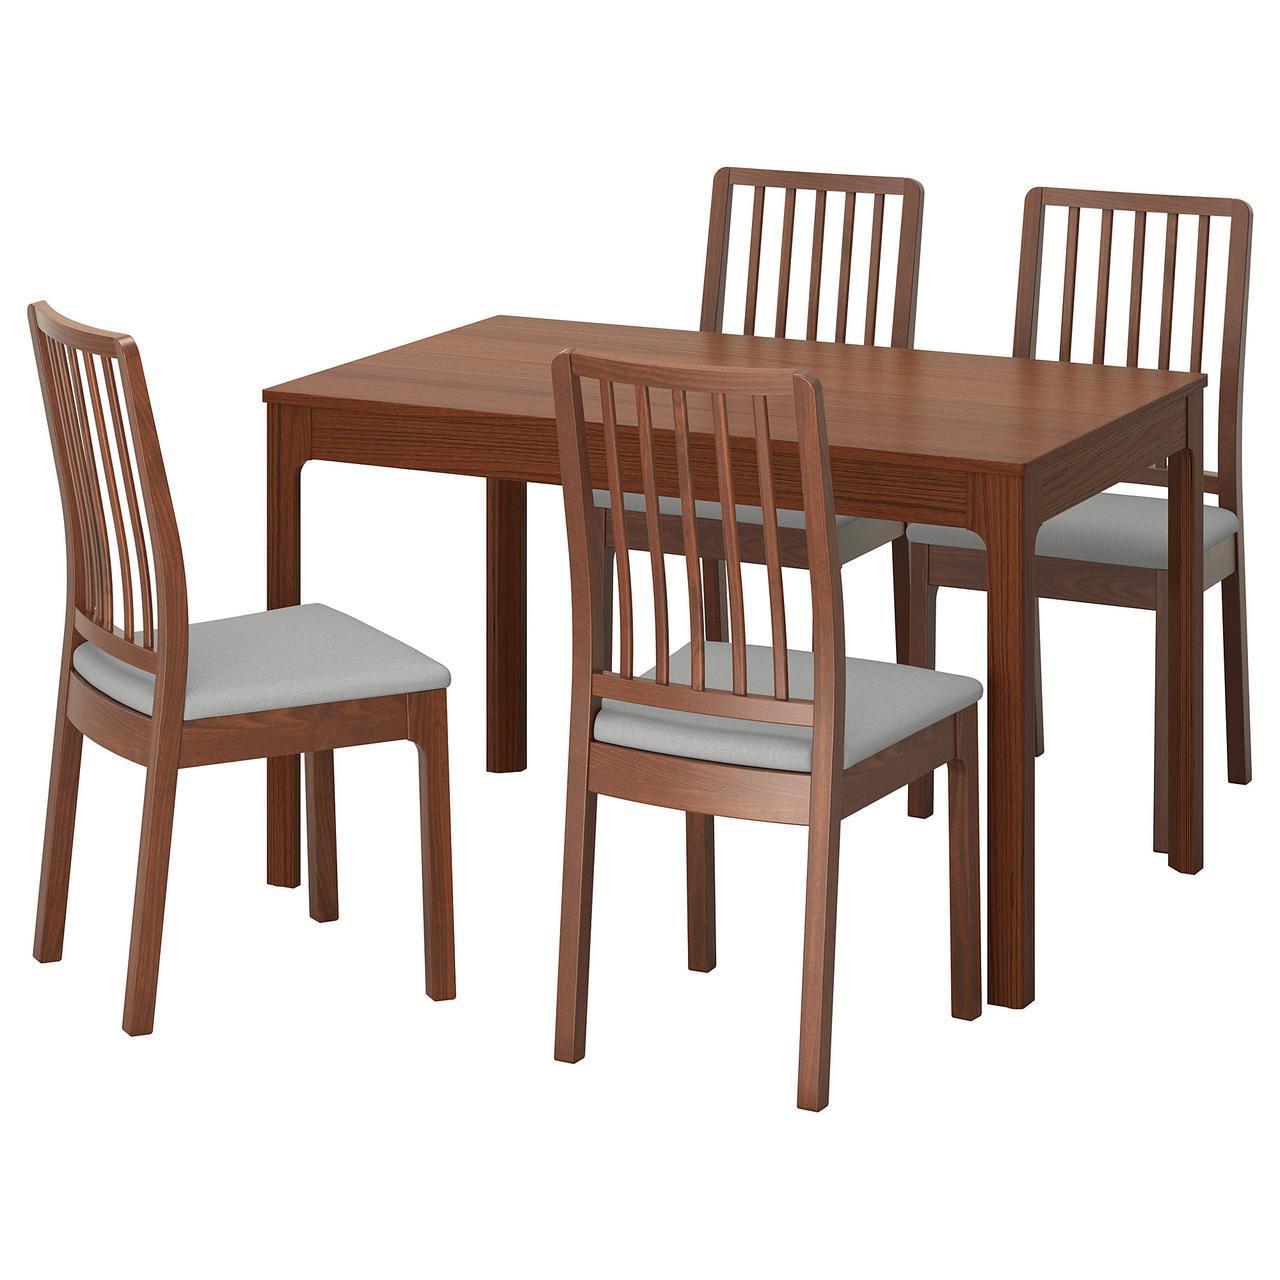 IKEA EKEDALEN / EKEDALEN (292.214.35) Стол и 4 стула коричневый, Orrsta светло-серый